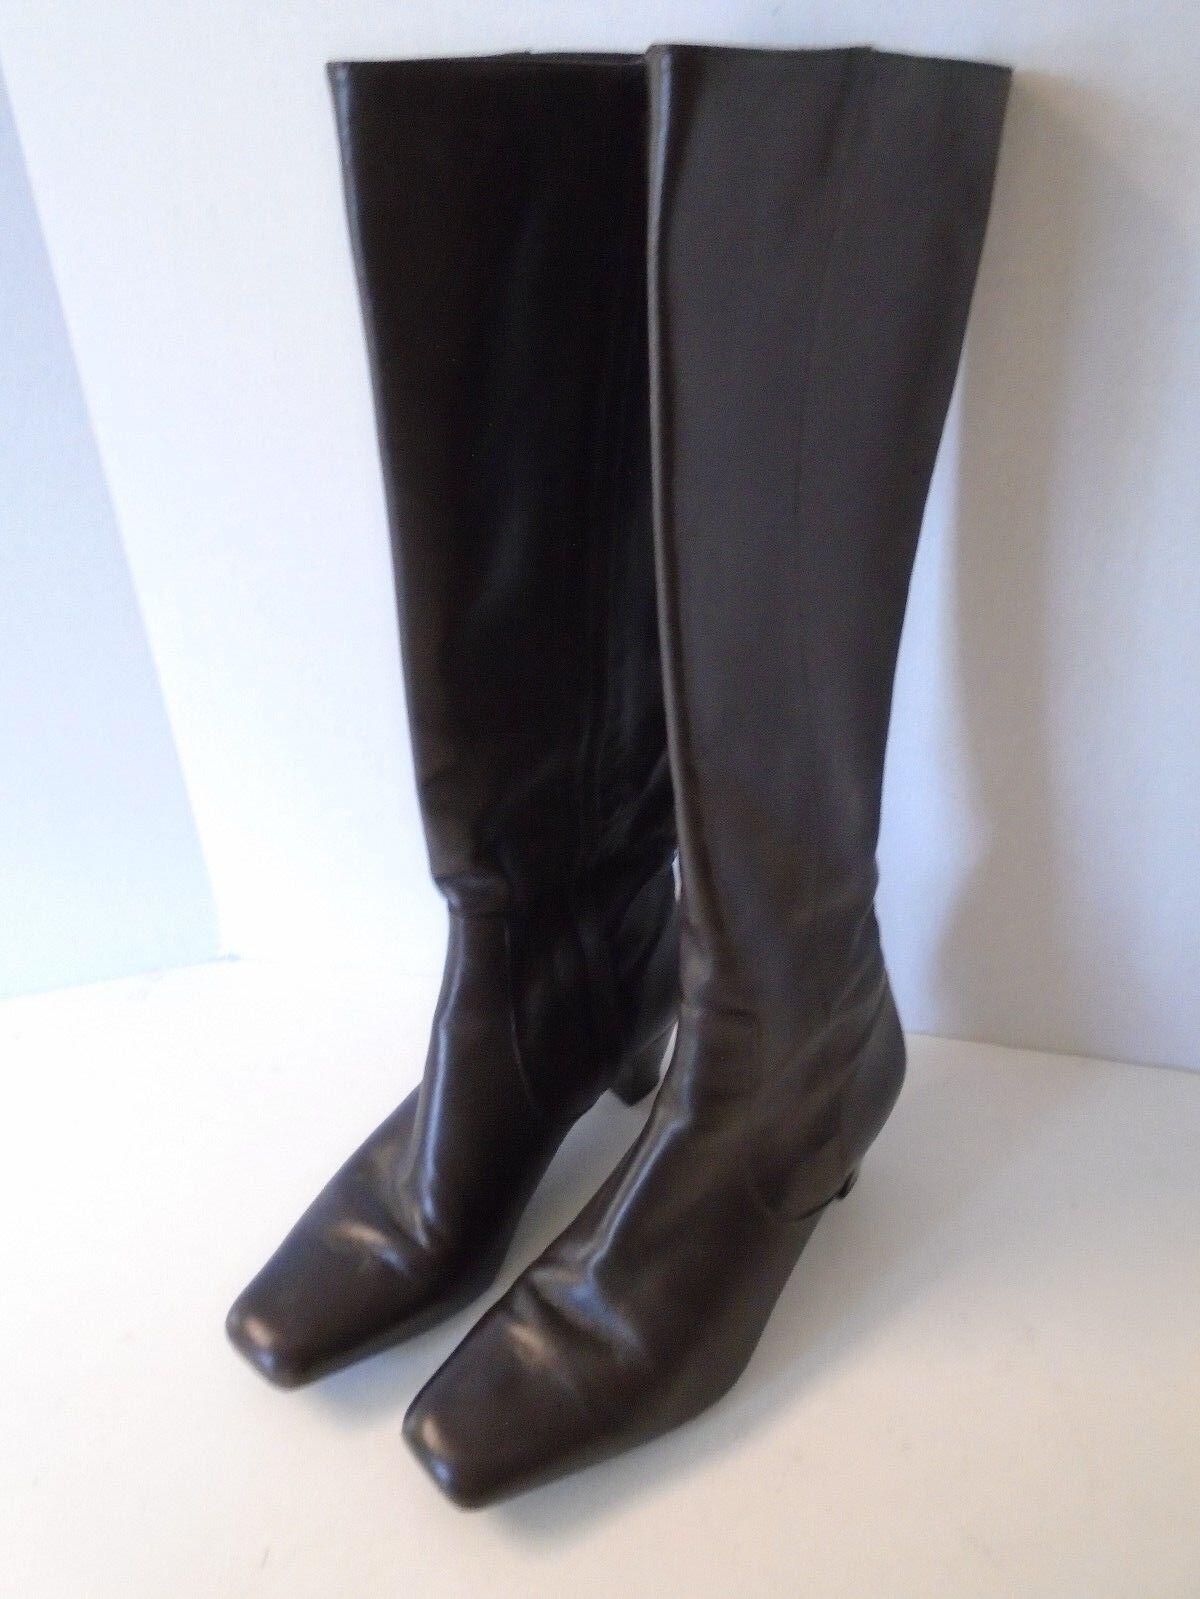 Cole Haan Marronee stivali 8 M  Leather Medium Heel Square Toe Made in Brazil